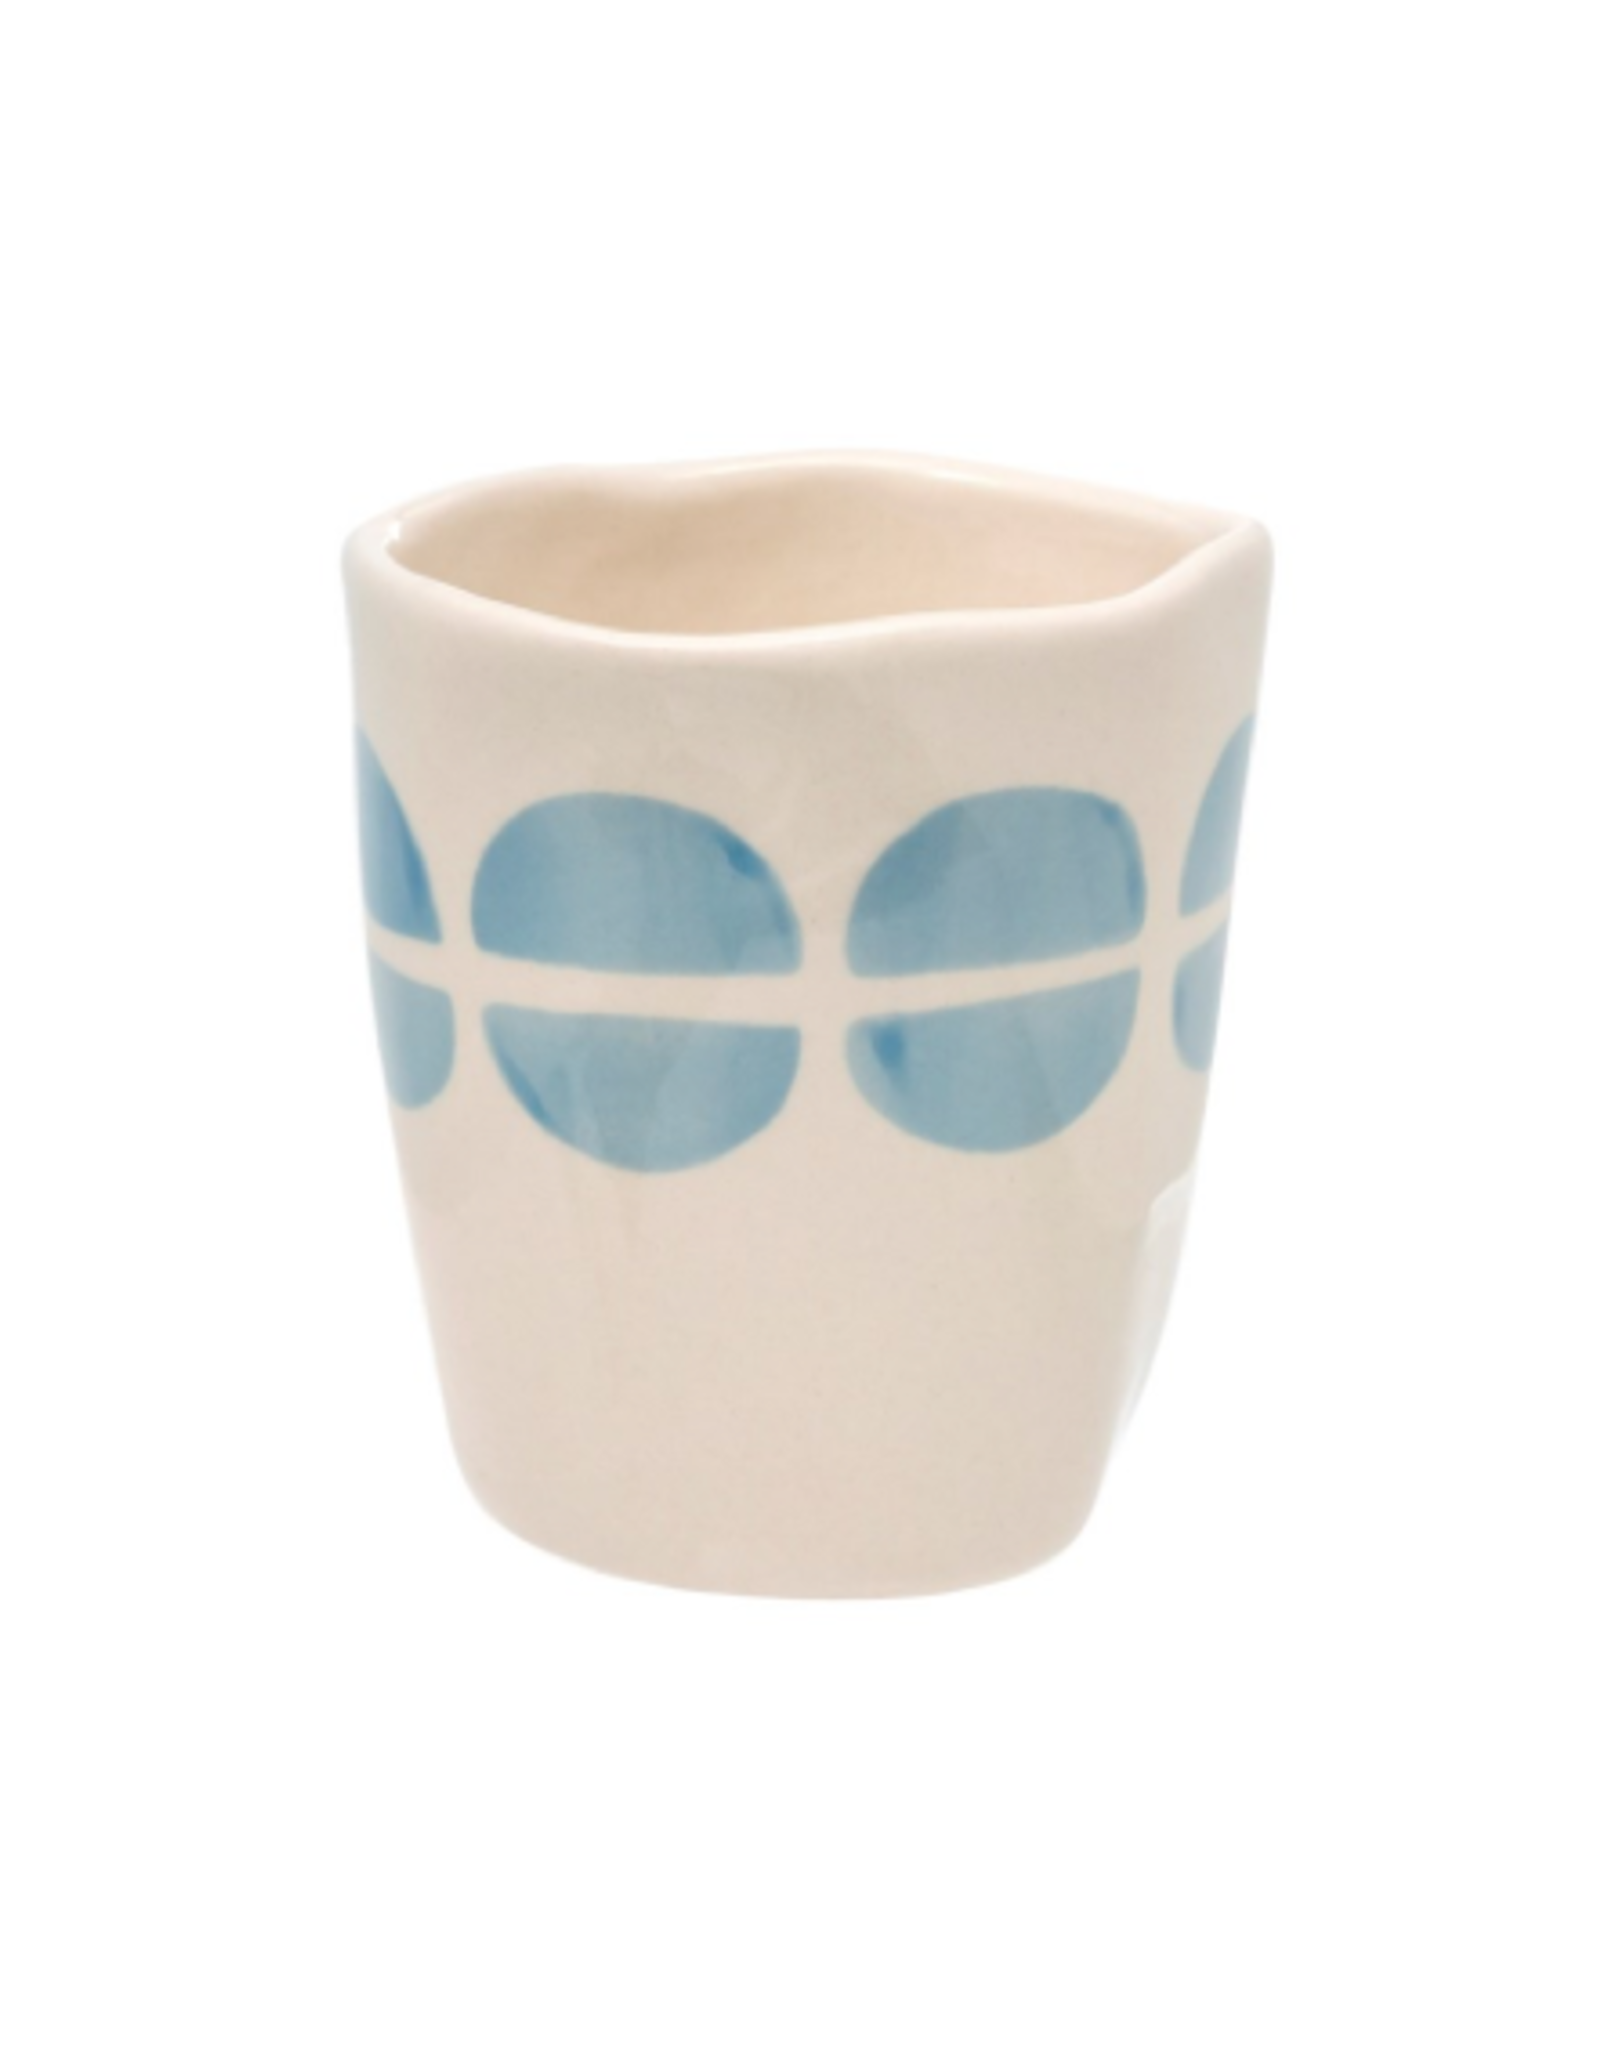 IBA - Ceramic Cup/Disk